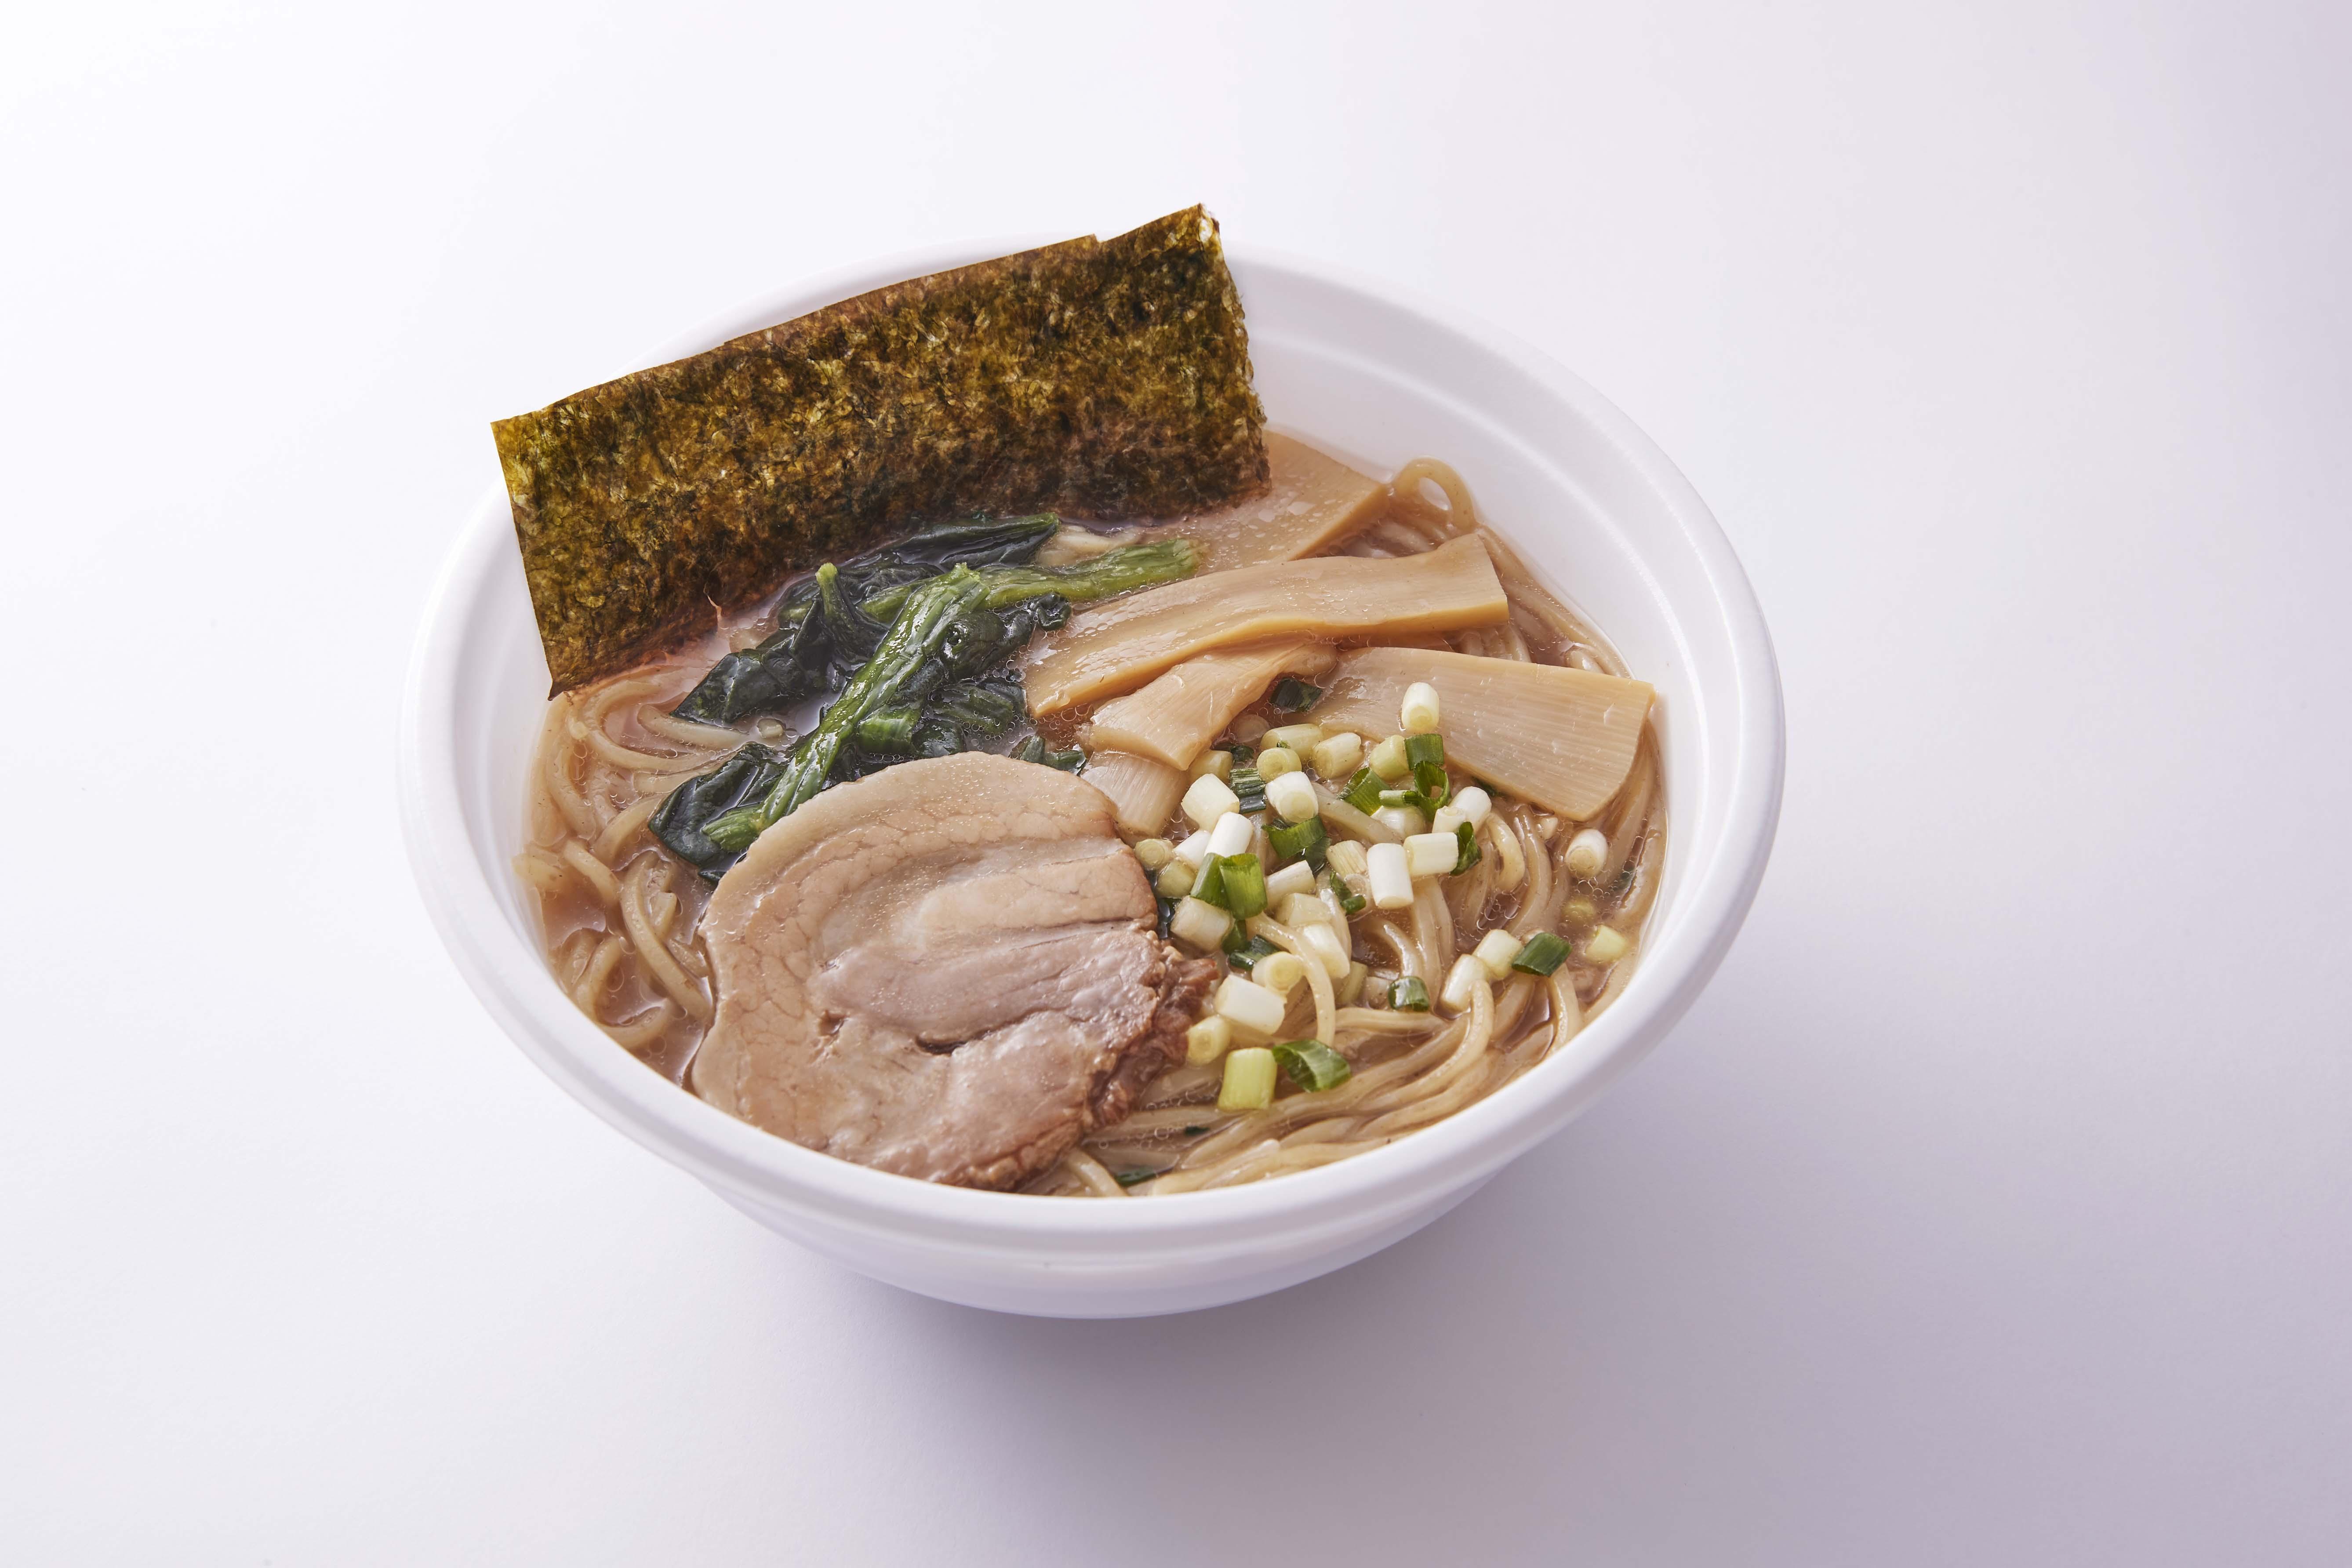 Foods & Shop - Item - 横濱家系豚骨醤油ラーメン